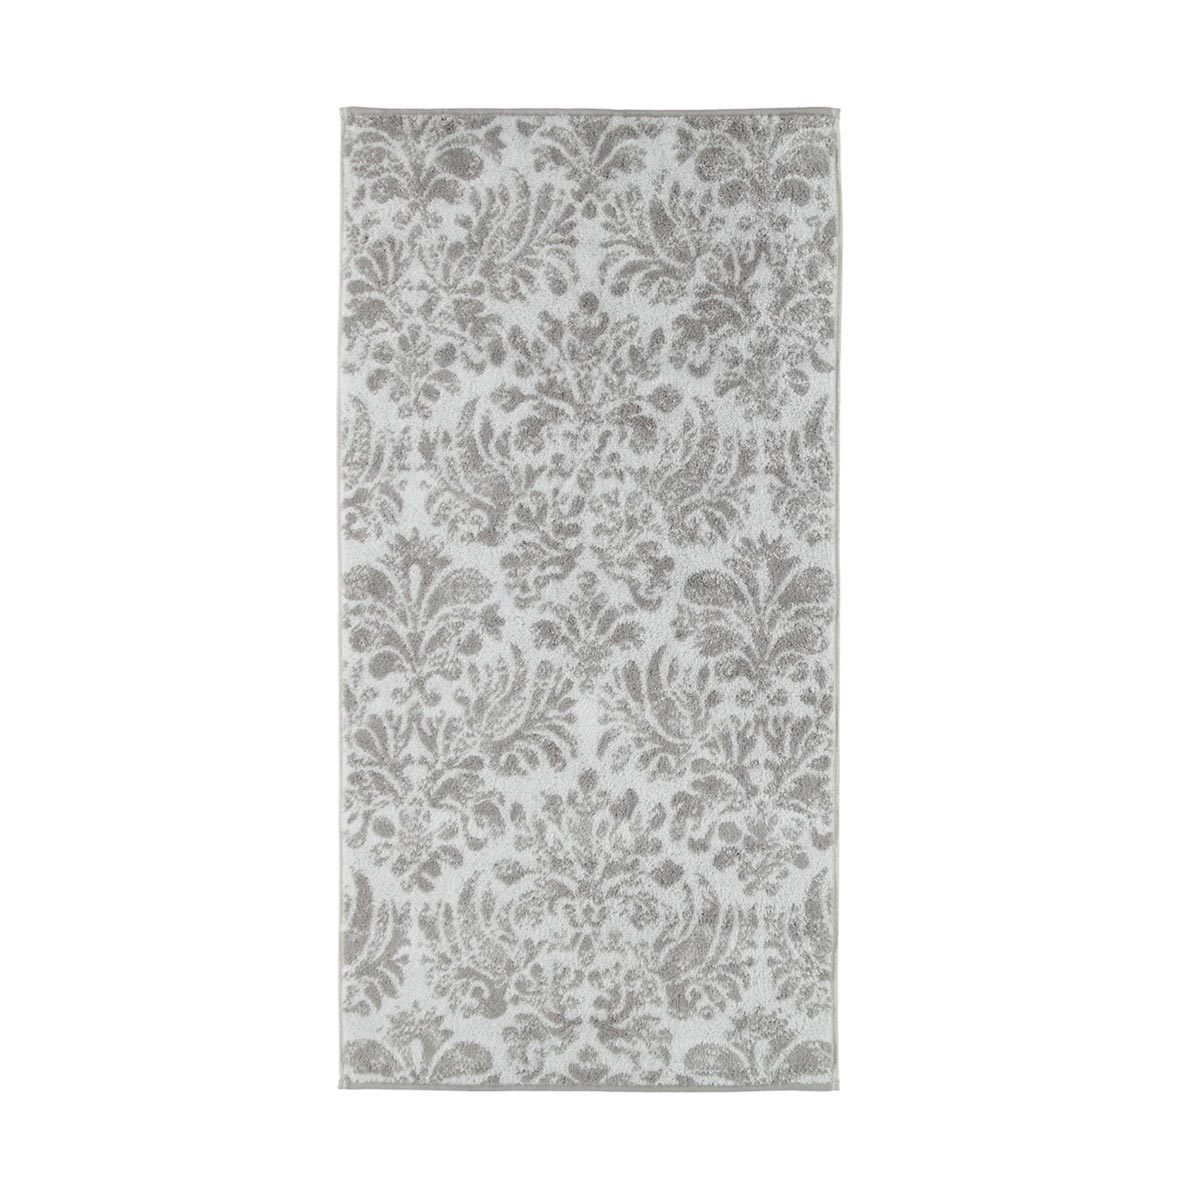 caw handt cher noblesse vintage ornament g nstig online kaufen bei bettwaren shop. Black Bedroom Furniture Sets. Home Design Ideas